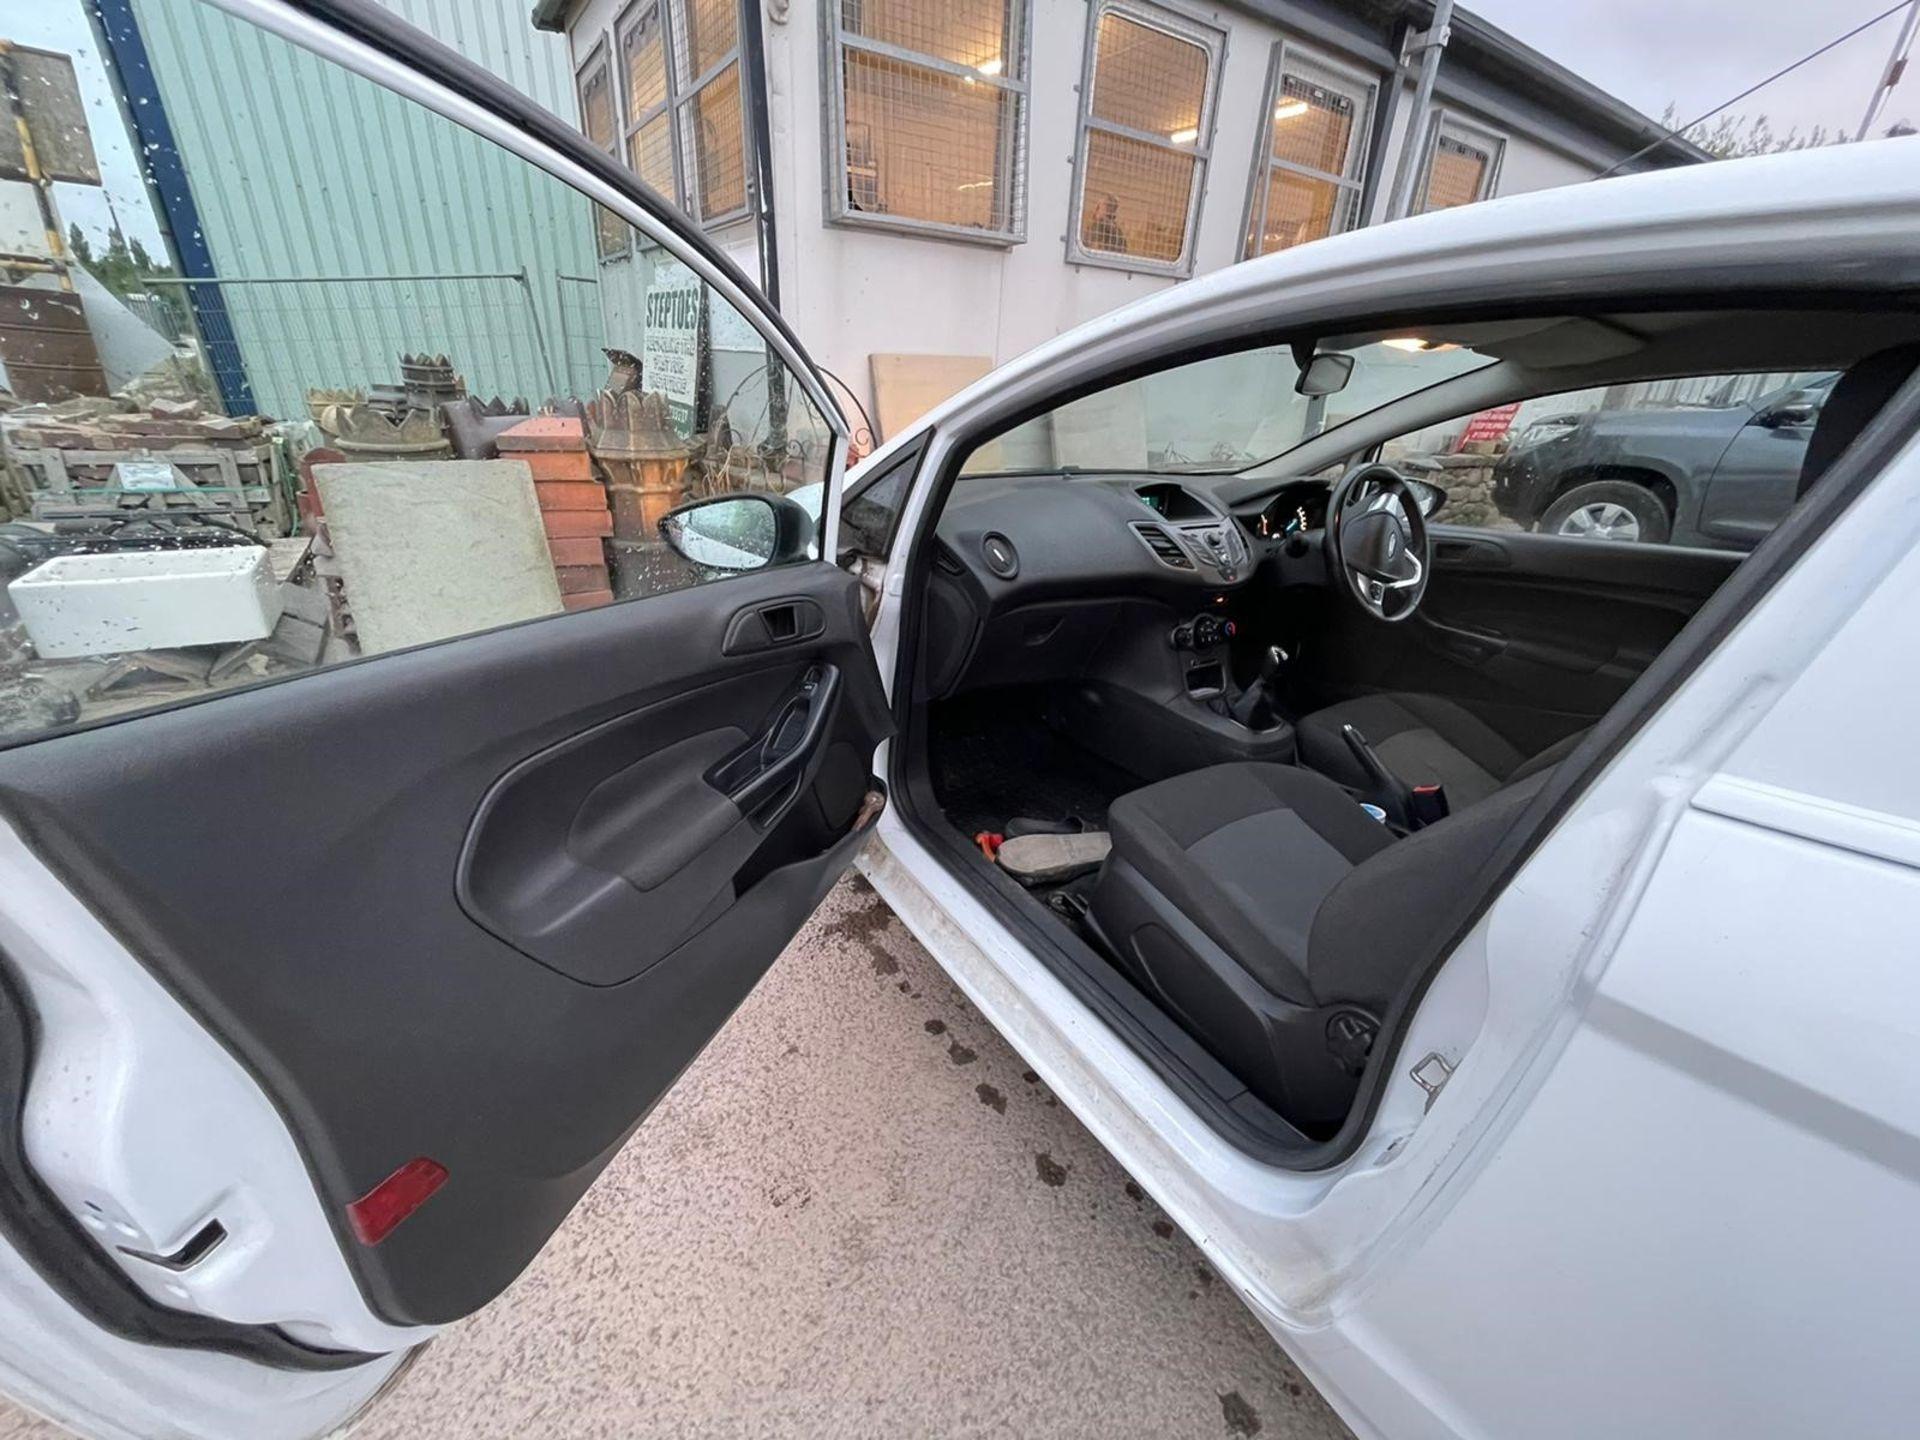 Ford Fiesta Econetic Tech TDCI Diesel Car Derived Van, registration no. YR14 XGW, date first - Image 4 of 5